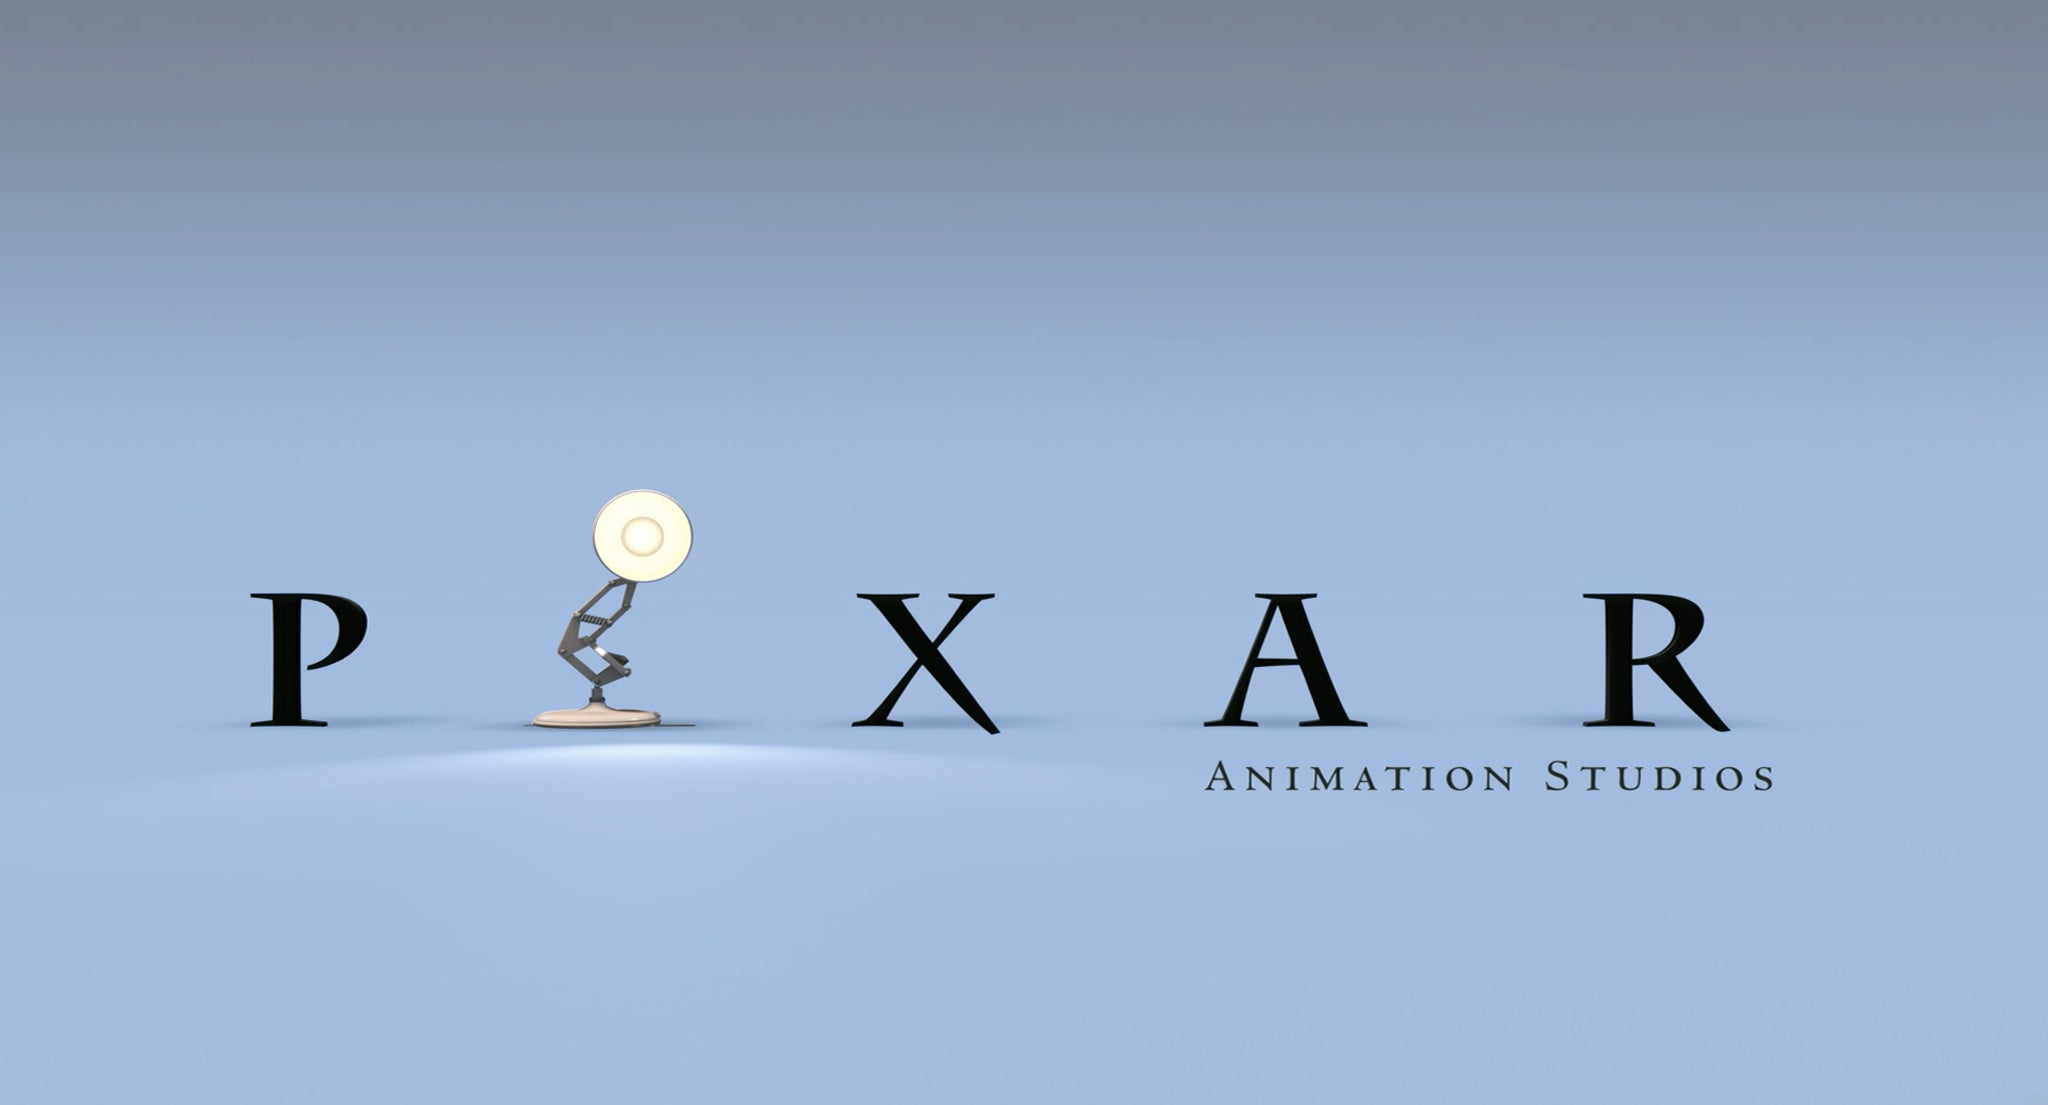 All Of Pixar's Short Films, Ranked